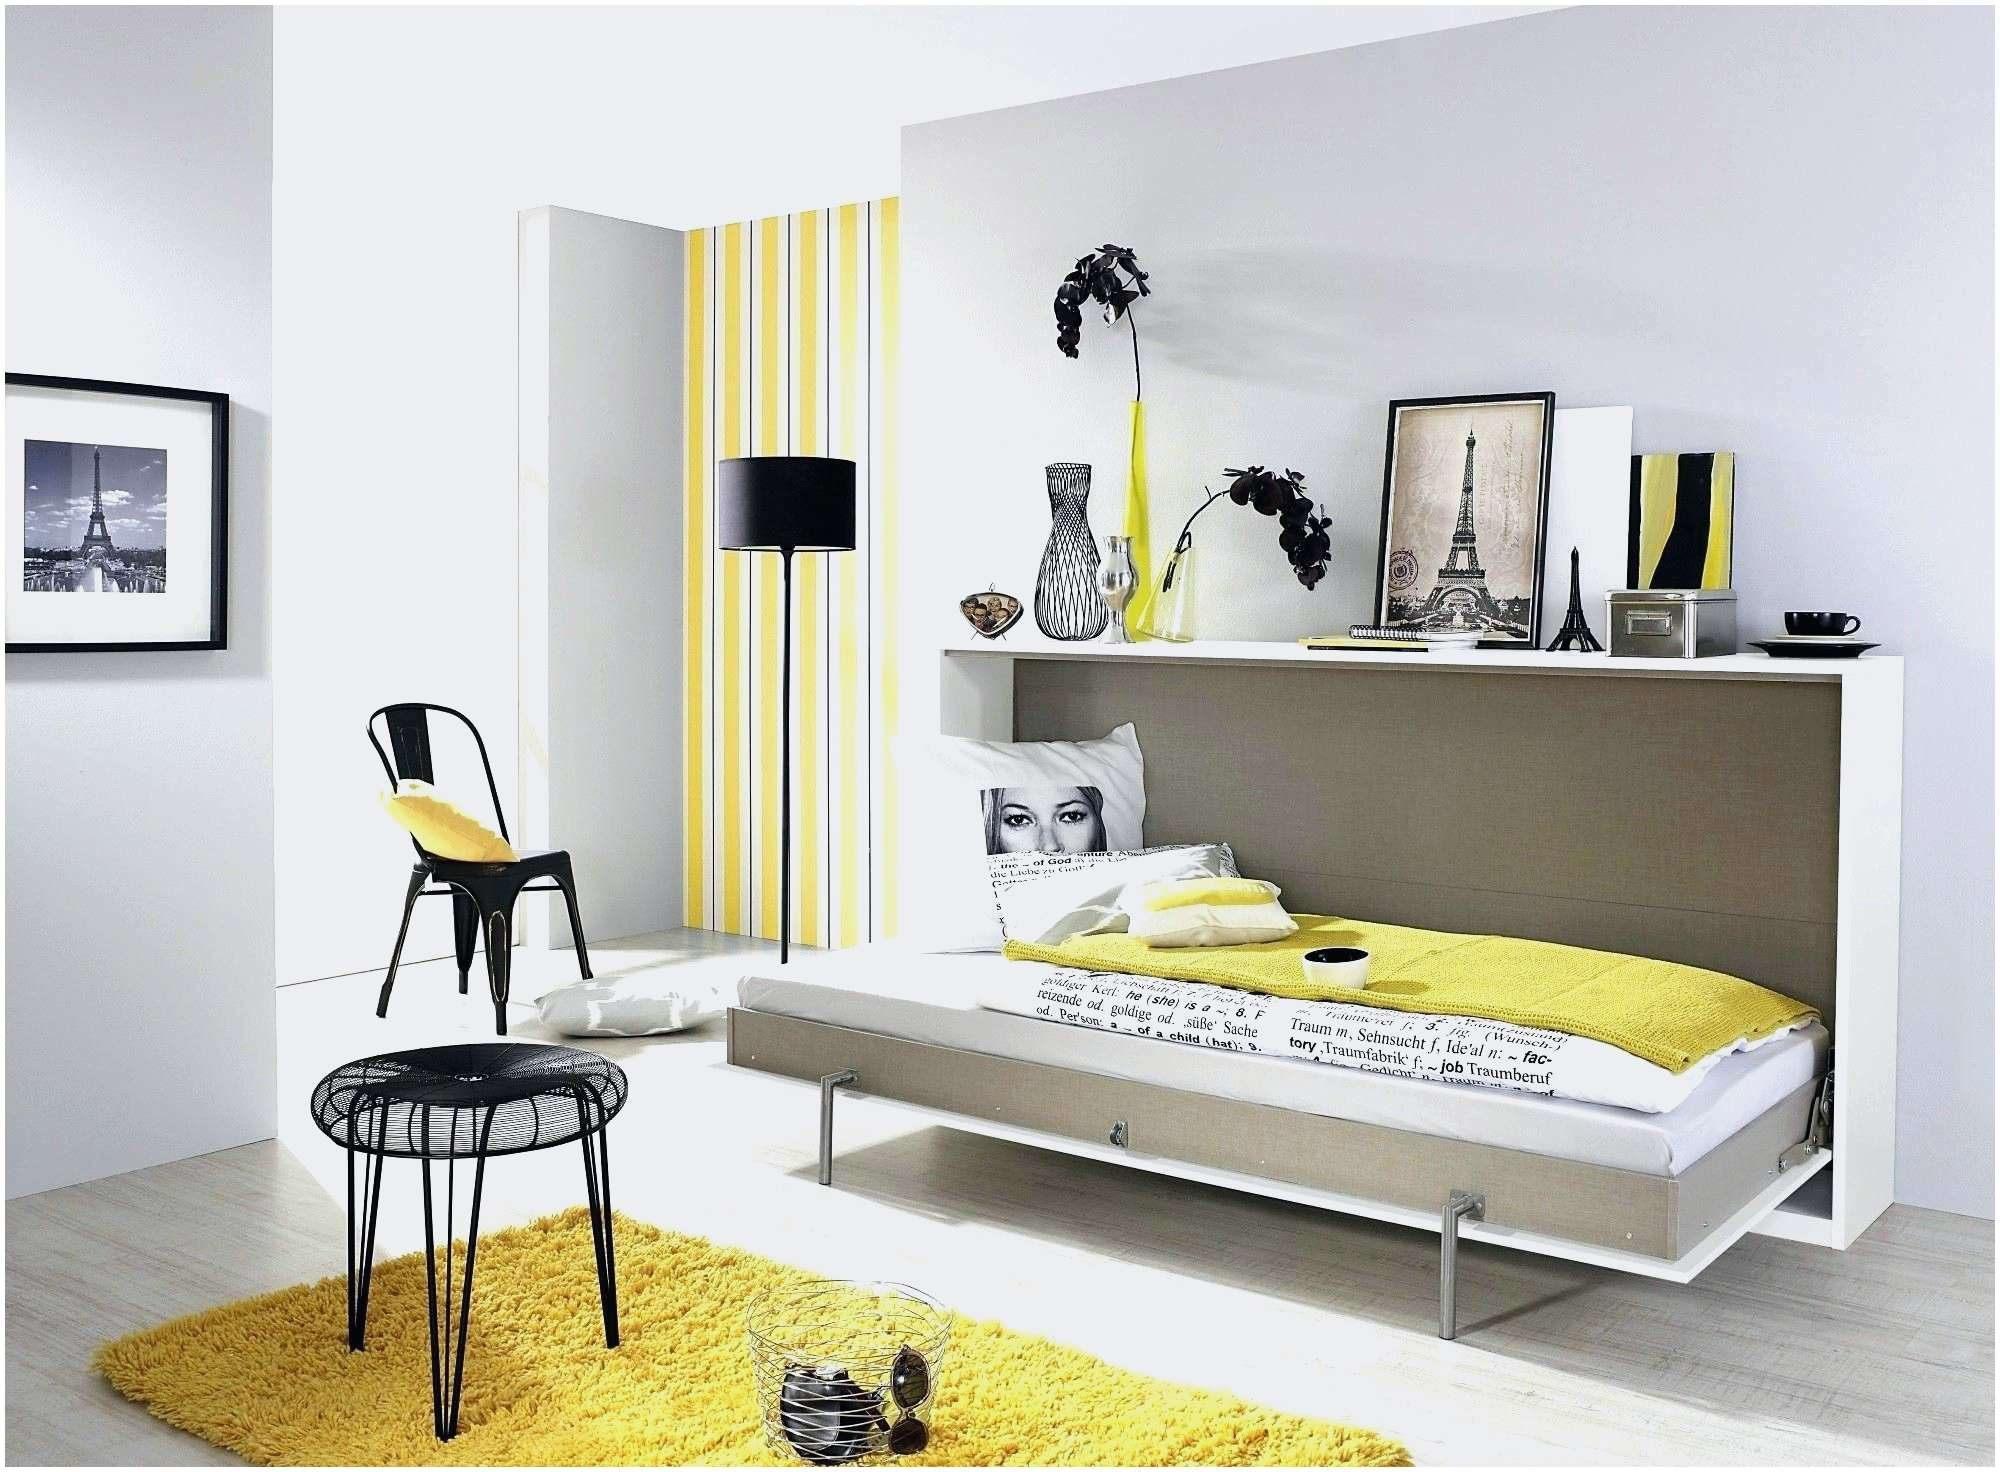 Canapé Lit Fer forgé Joli Impressionnant Canapé Ikea Convertible Angle Beau S Canap